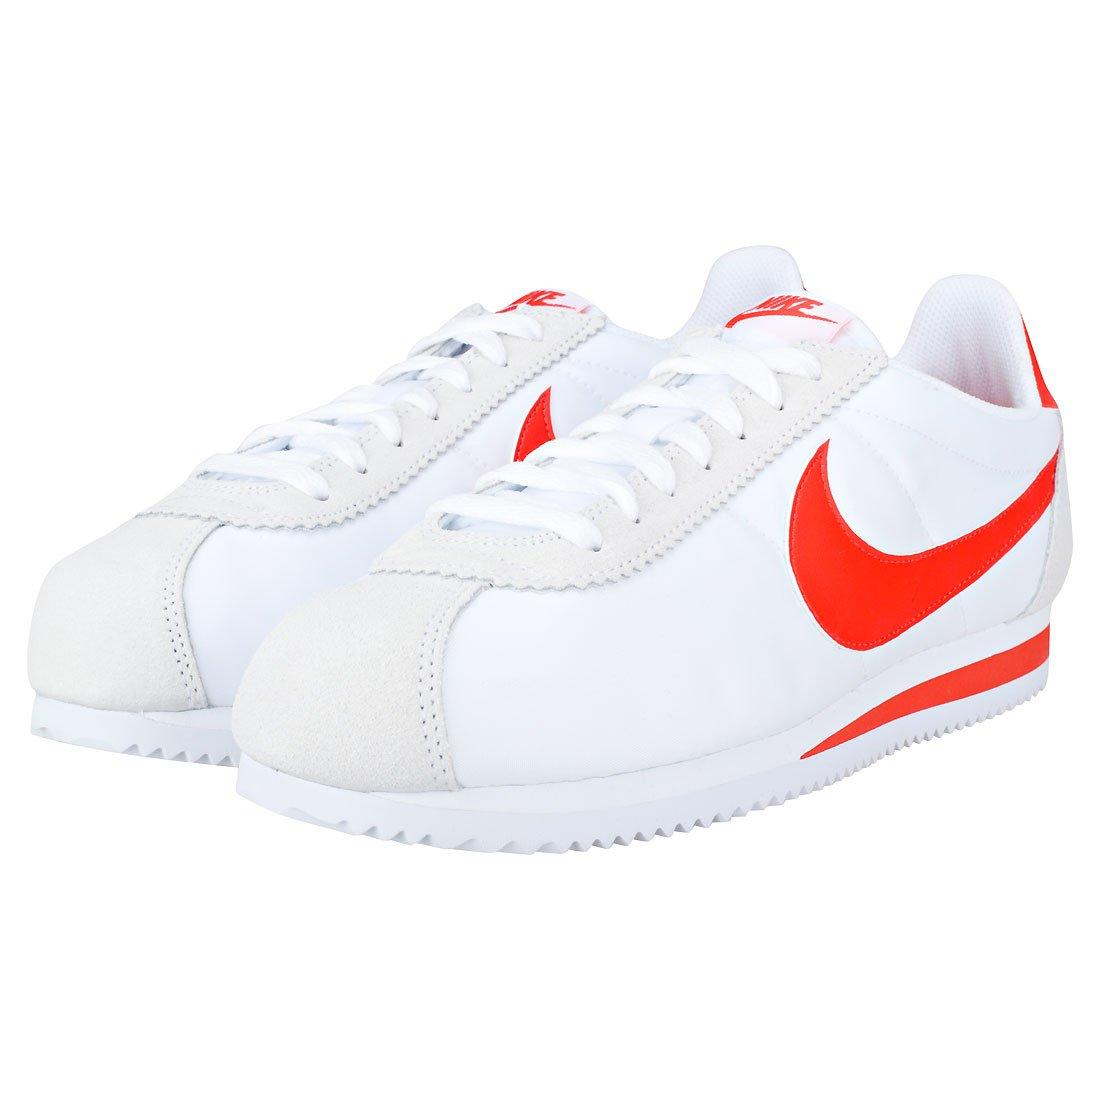 the best attitude 82c86 3b621 Nike Classic Cortez Nylon Habanero Red 807472101, Basket